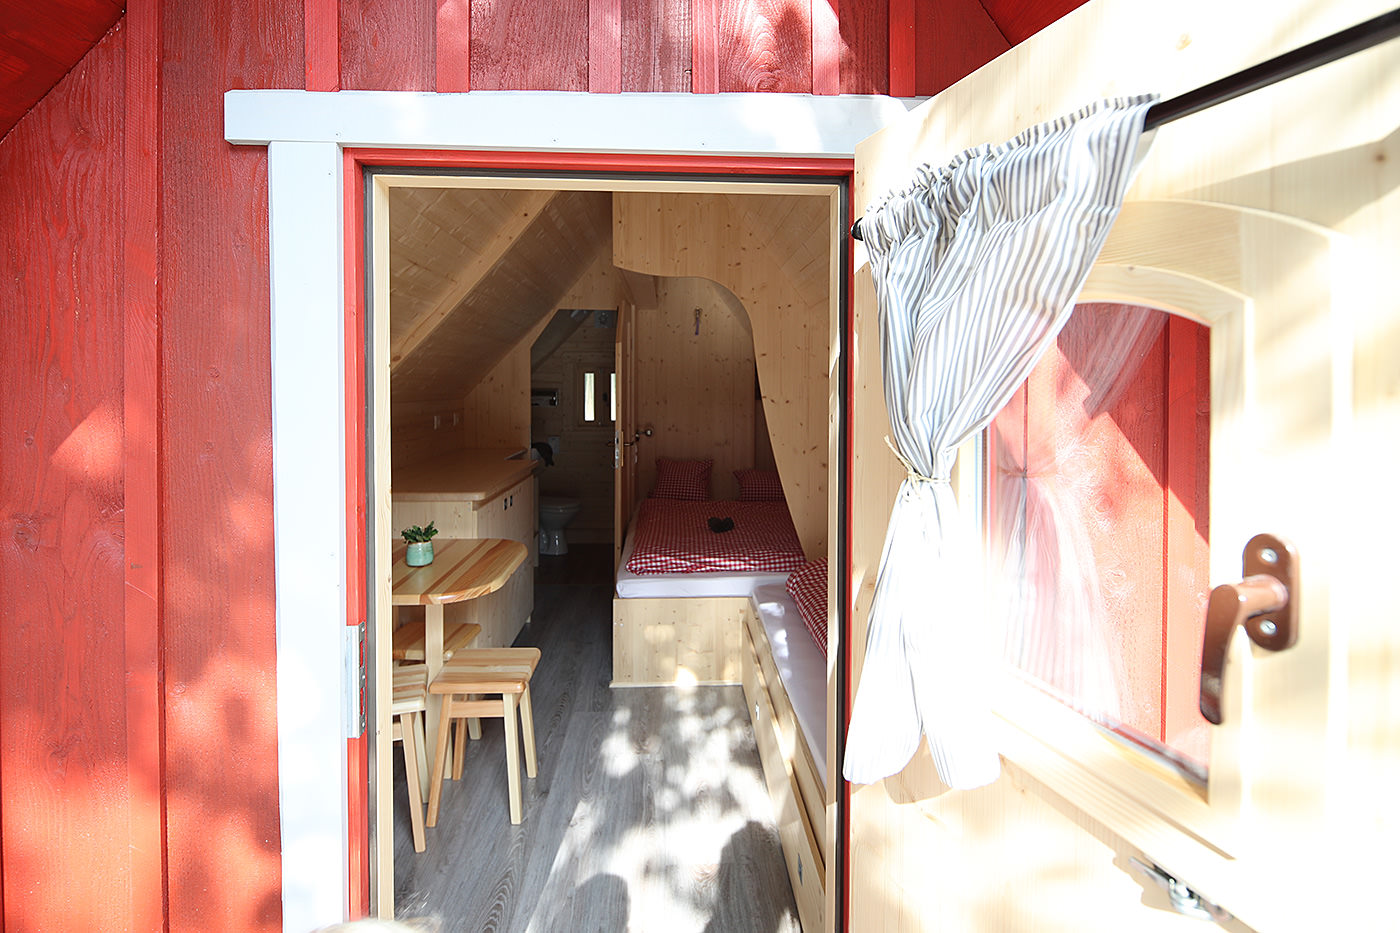 Trollhaus Rot Einblick